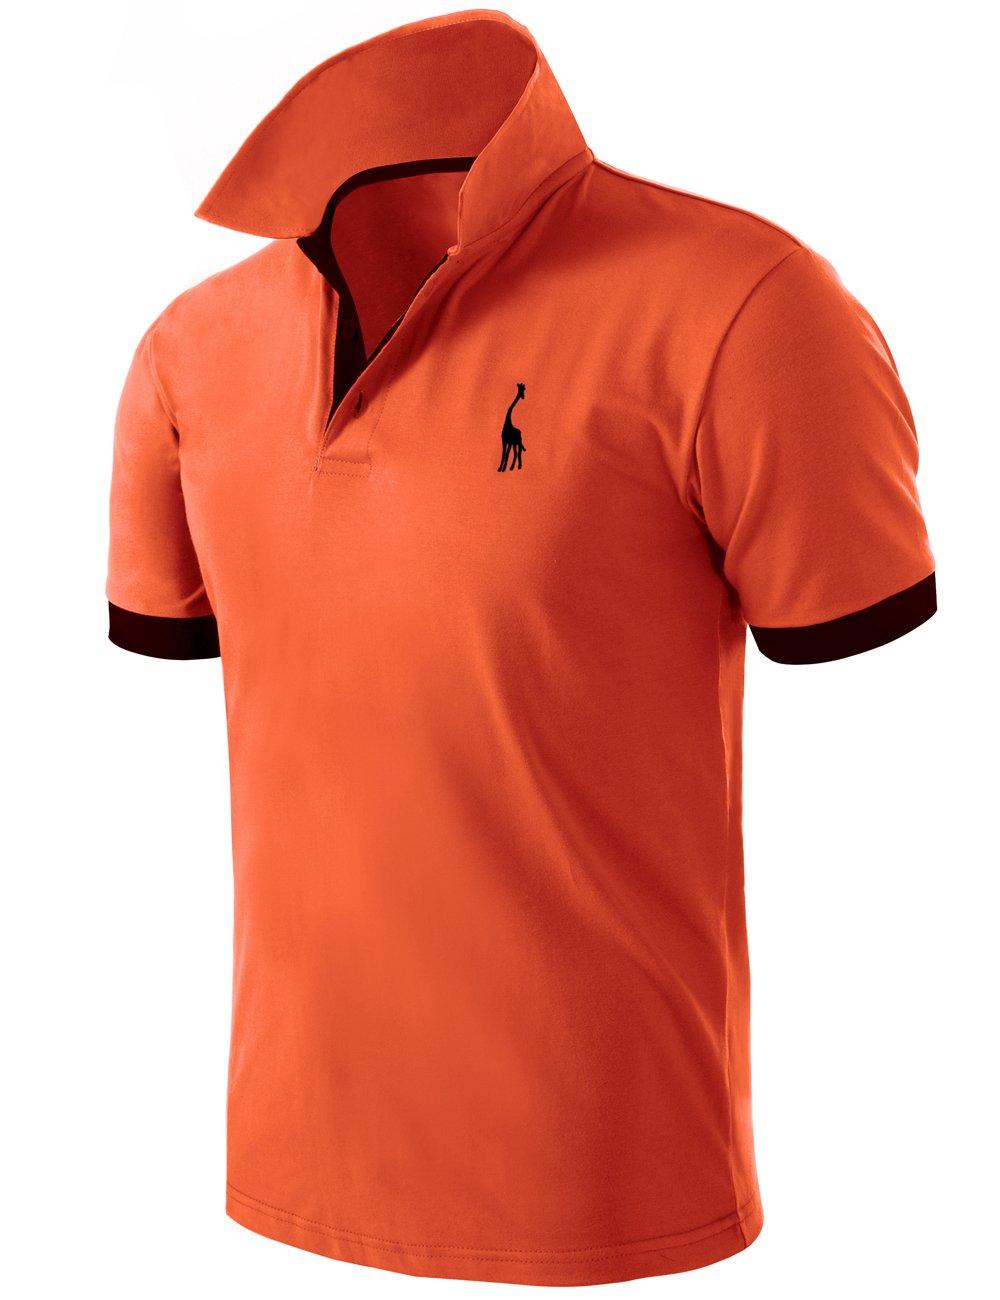 80c26506206d3 Pinkpum Mens Basic Polo Shirts Giraffe Golf Tennis T-Shirt Orange M